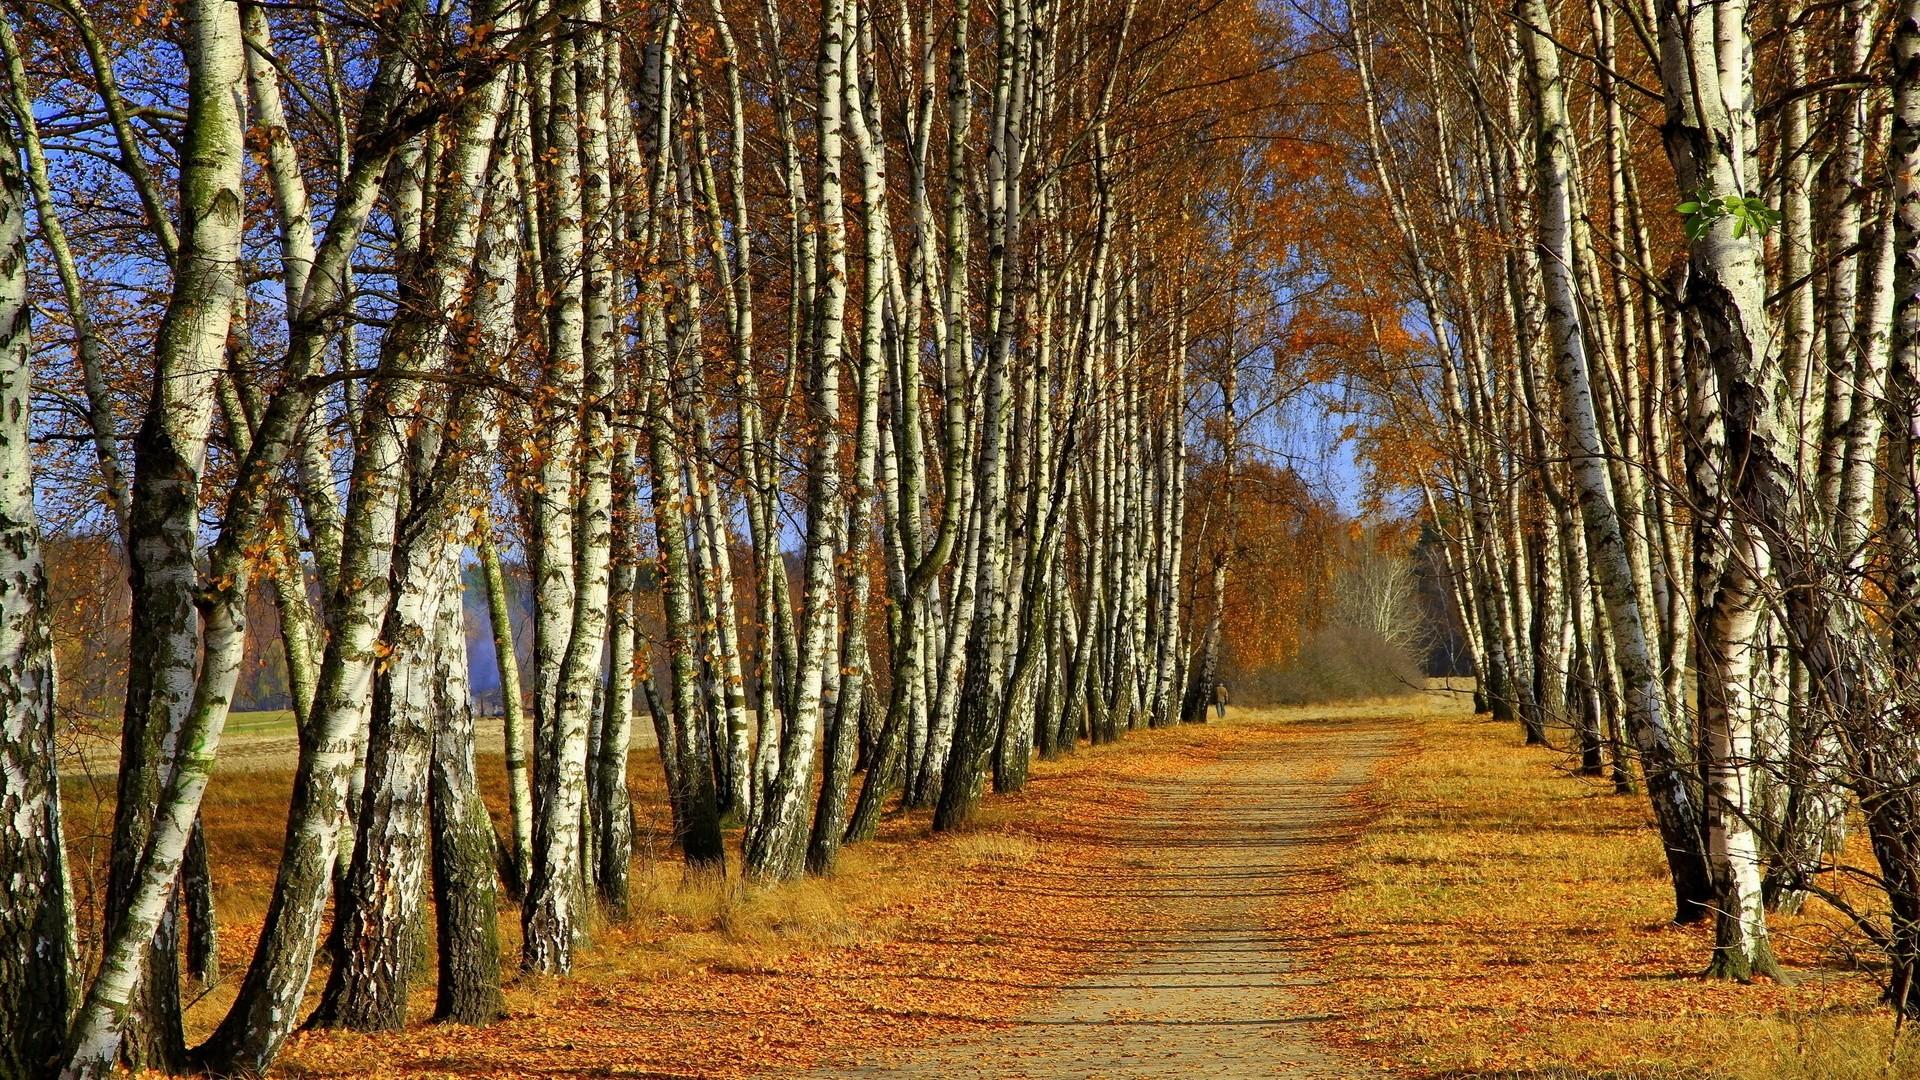 Birch Tree Wallpaper image hd